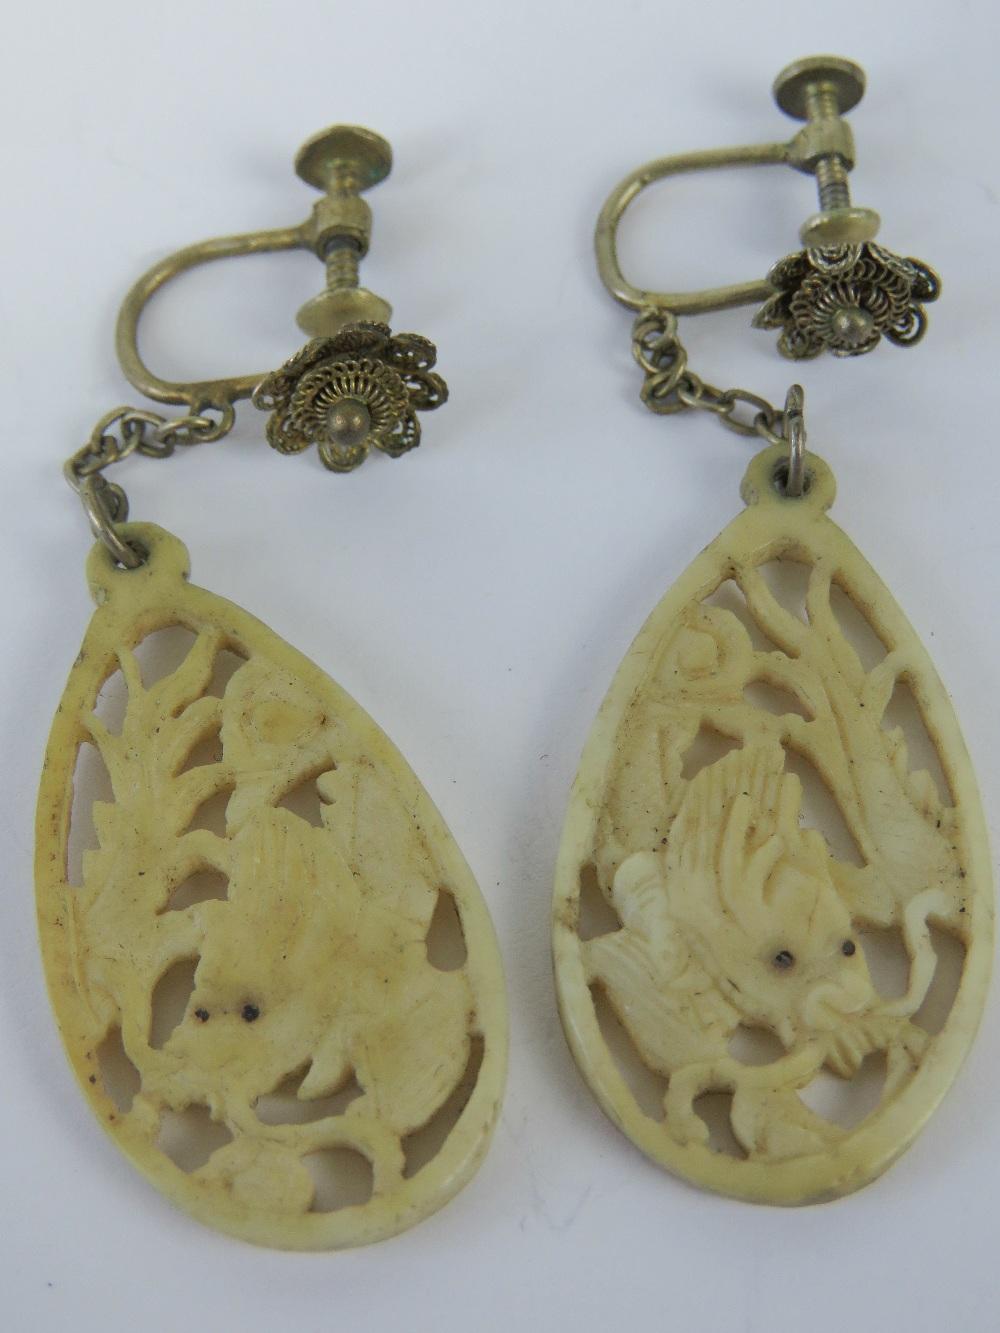 Lot 48 - A pair of carved bone earrings depicting